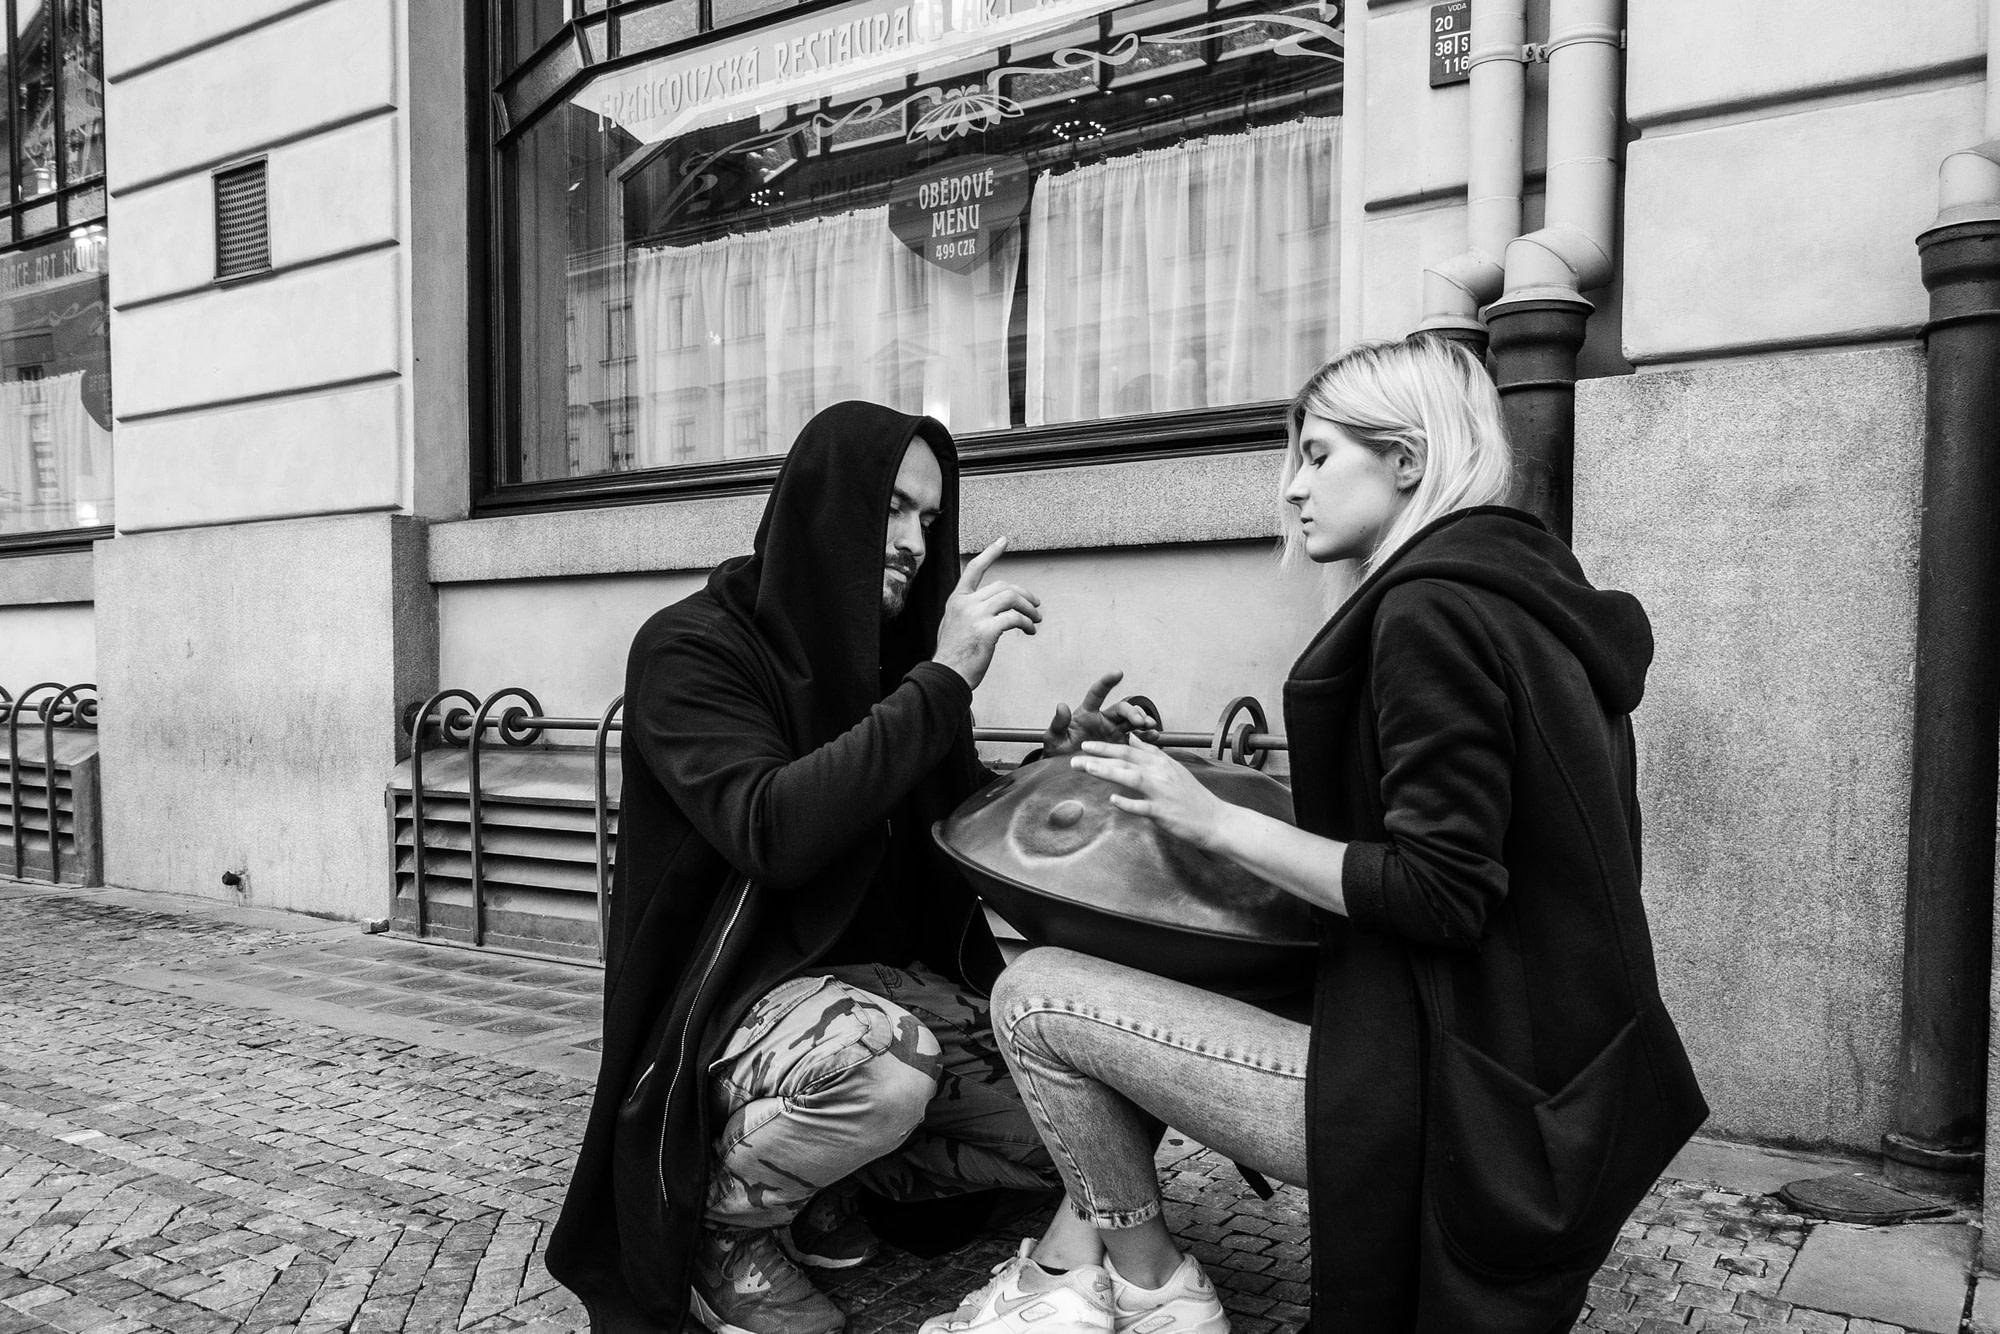 New Gallery: Street Musicians